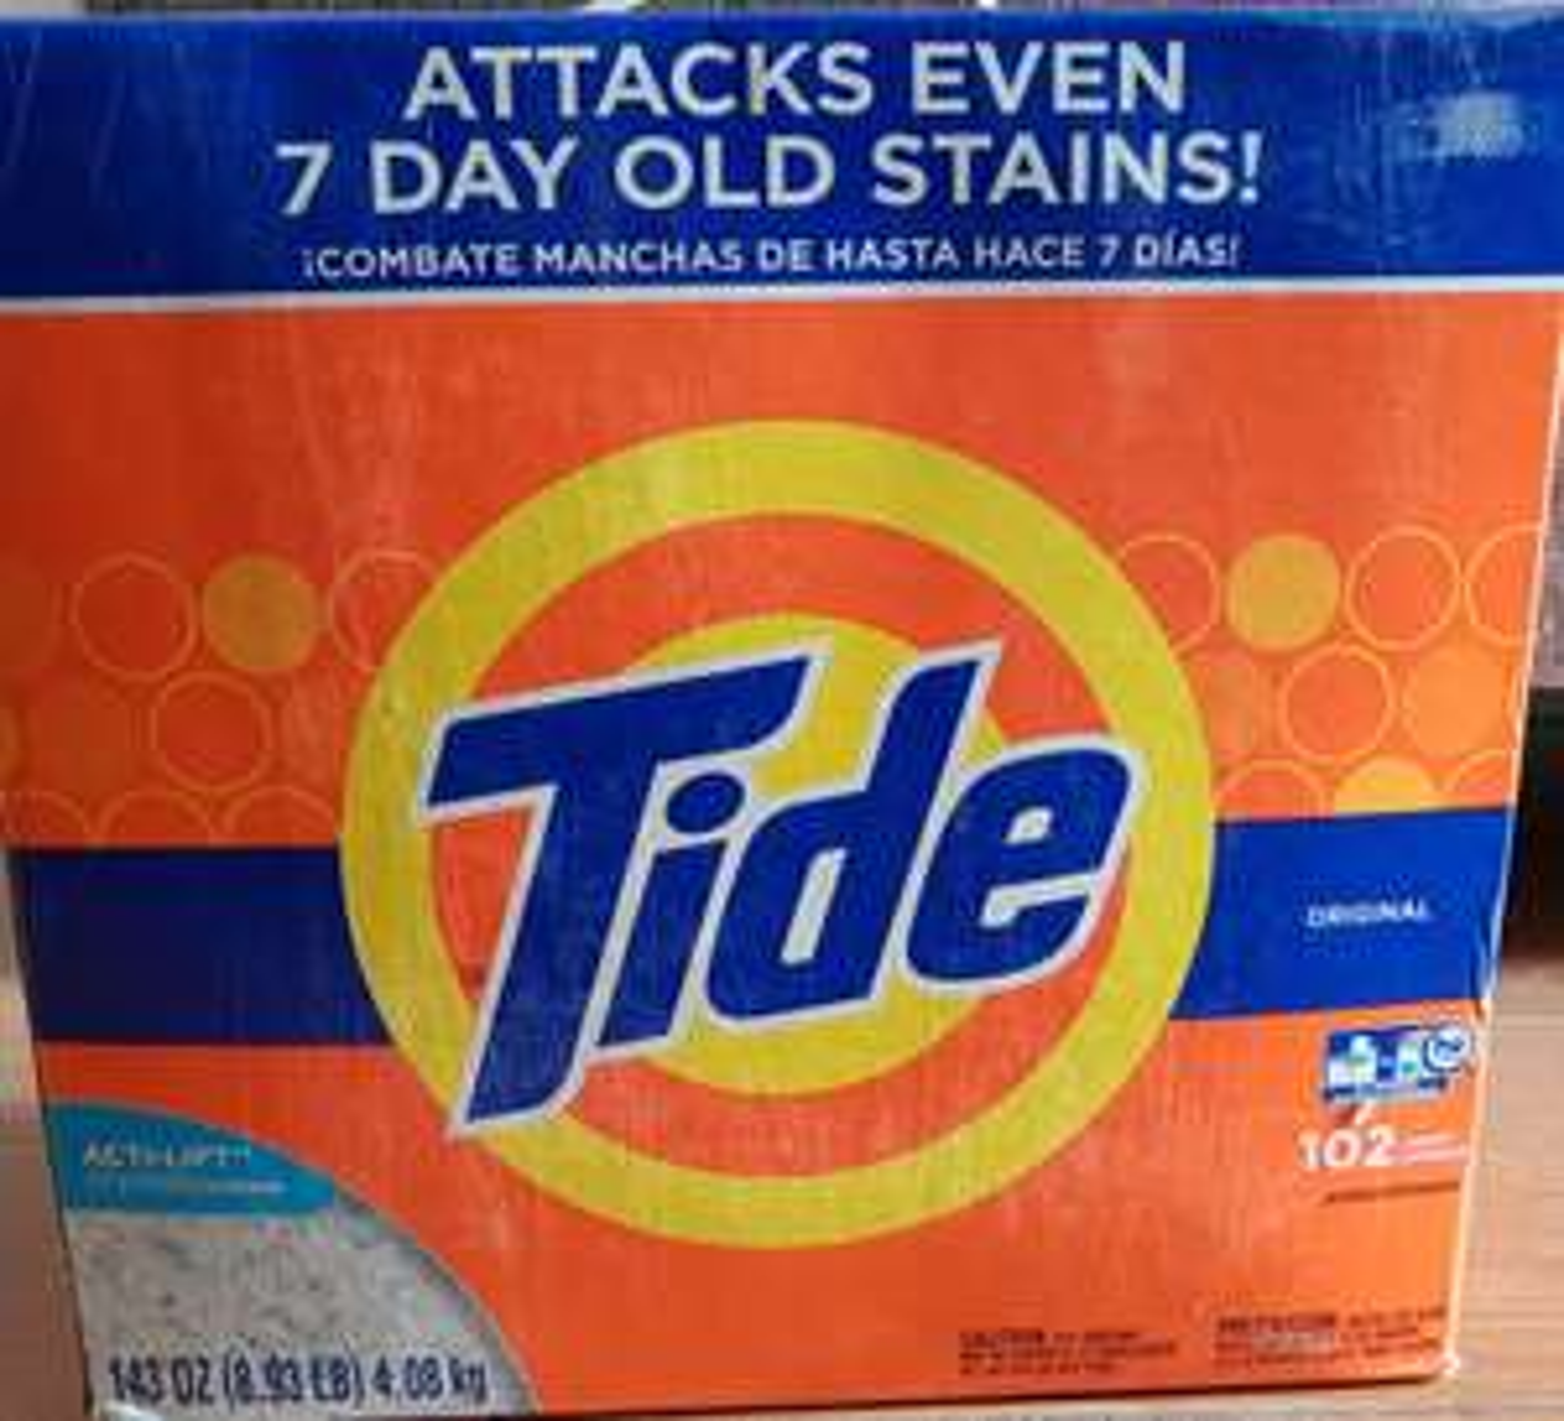 Superama Oliplaza CDMX, detergente Tide